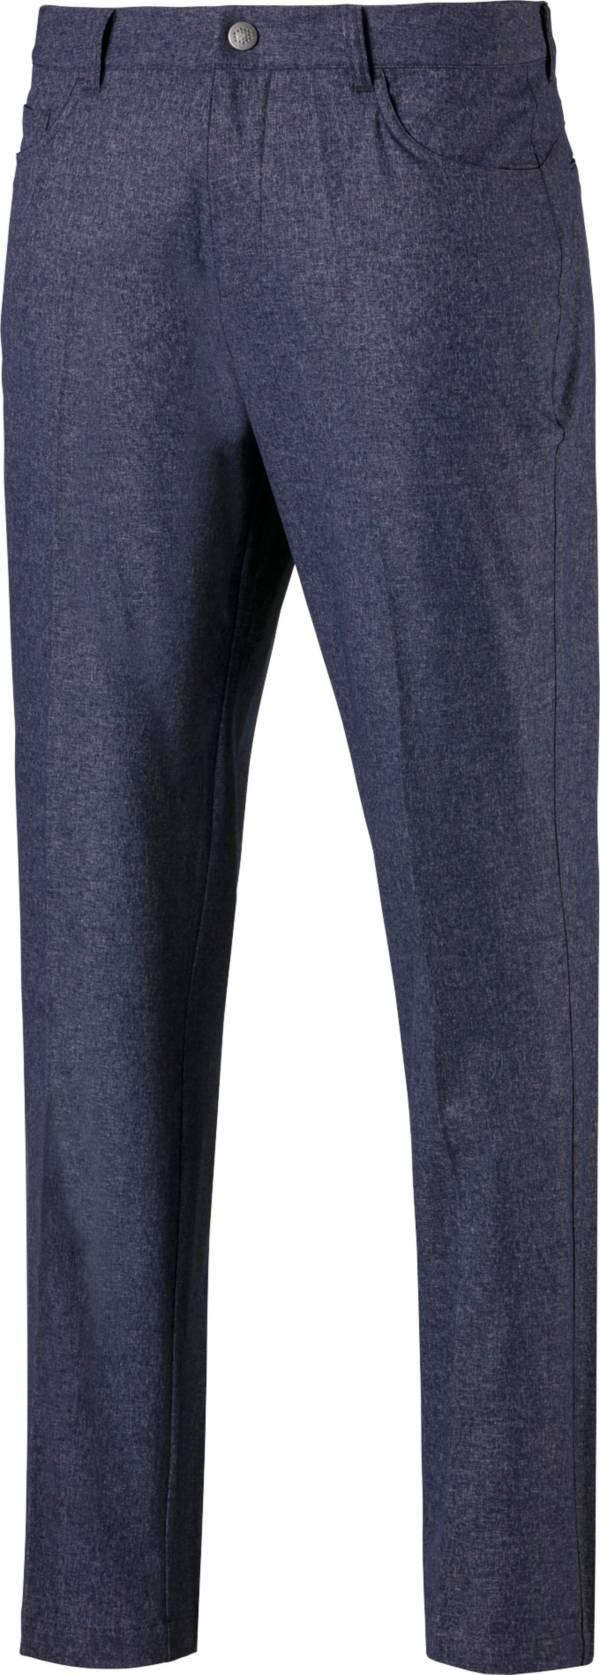 PUMA Men's Jackpot 5 Pocket Heather Golf Pants product image